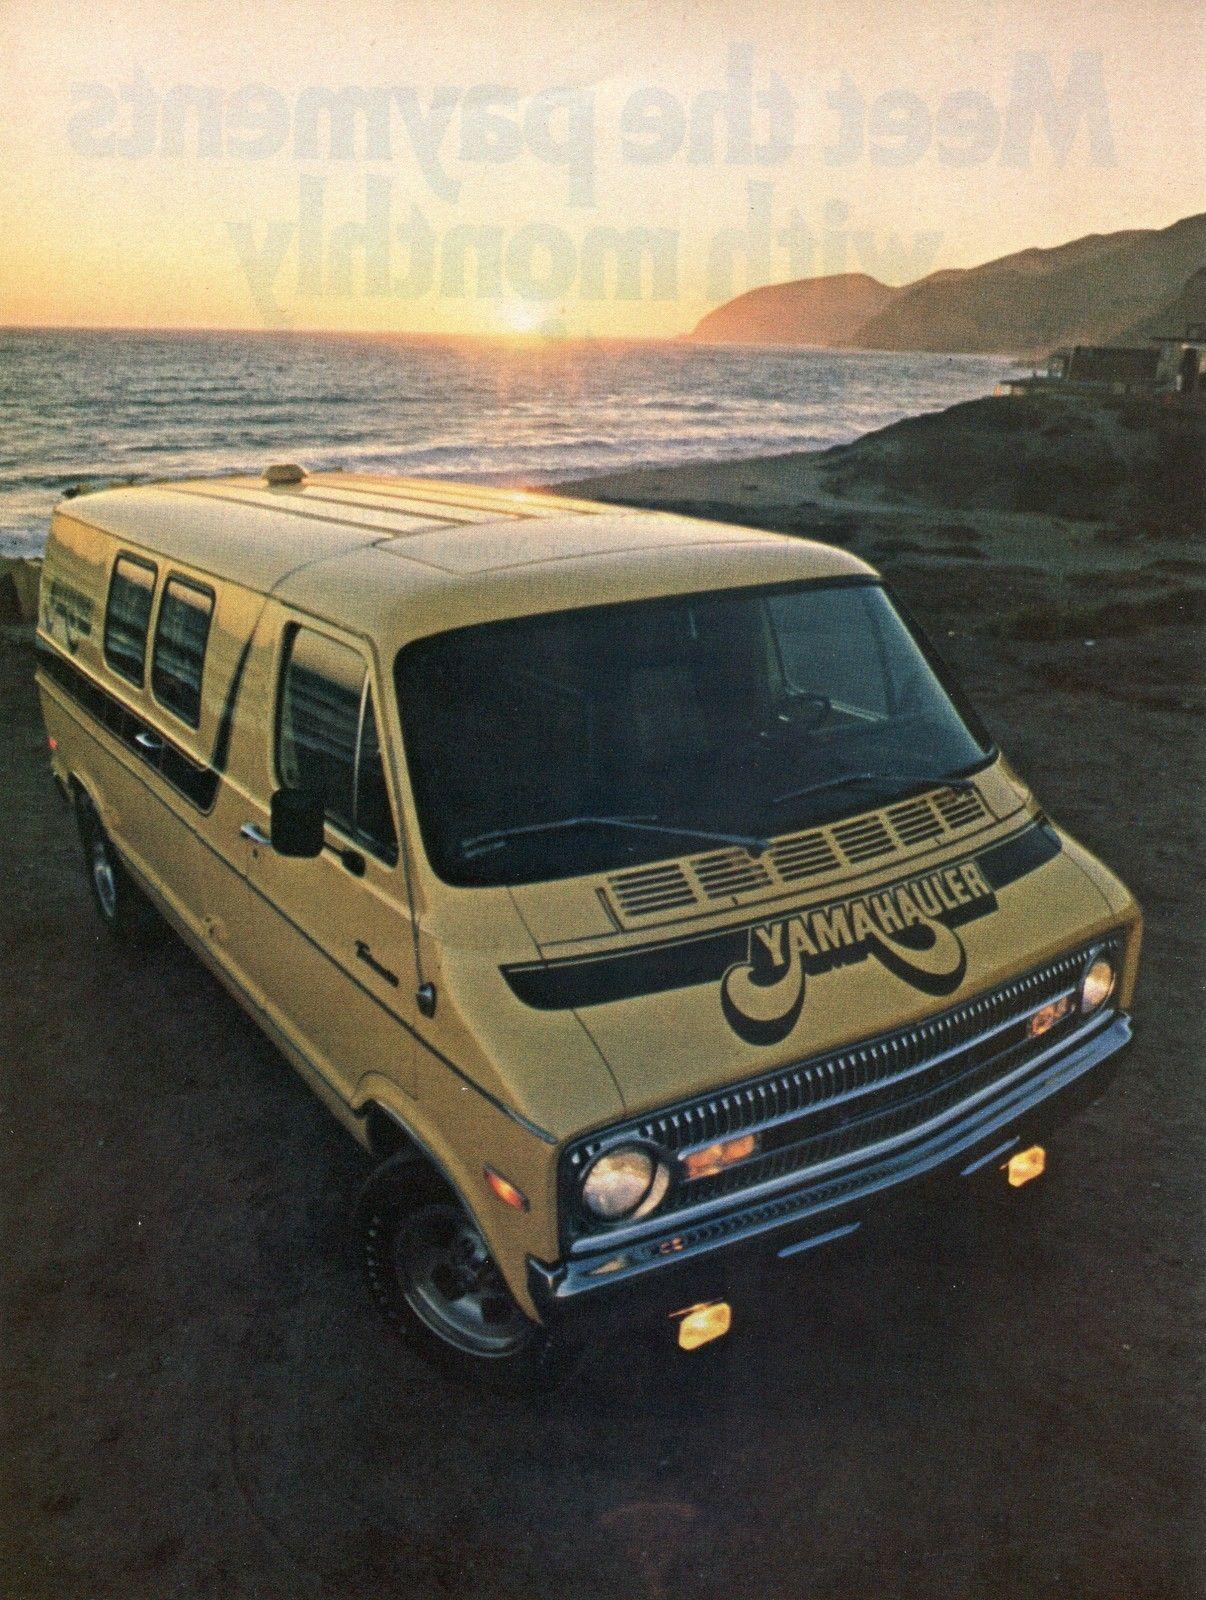 Van Campen Dodge : campen, dodge, Yamahauler, Dodge, School